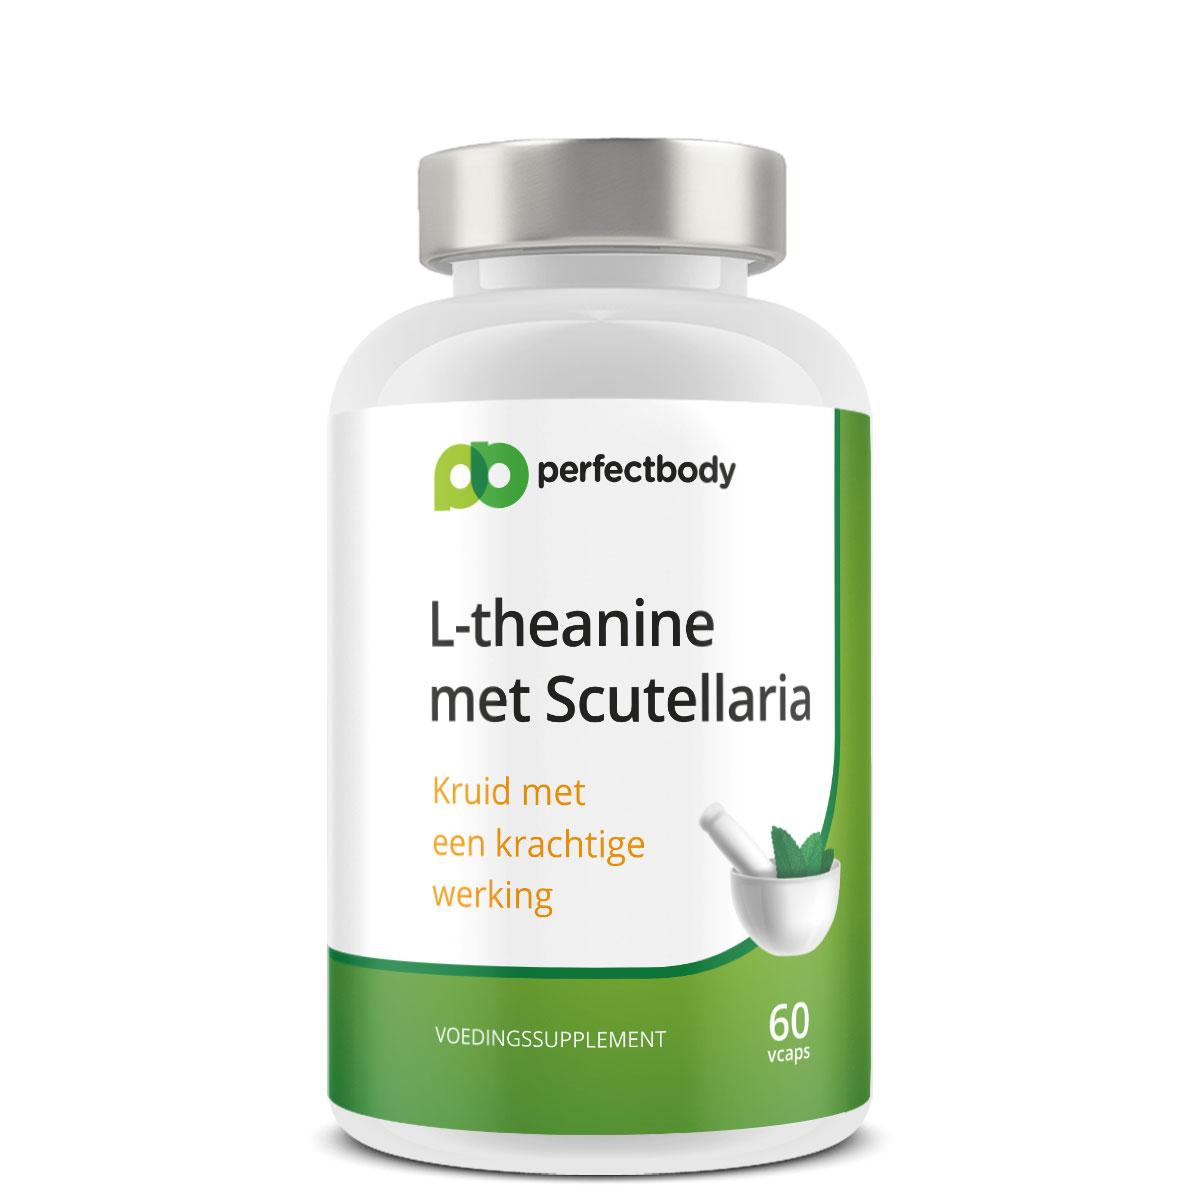 Perfectbody L-theanine Capsules 60 Vcaps